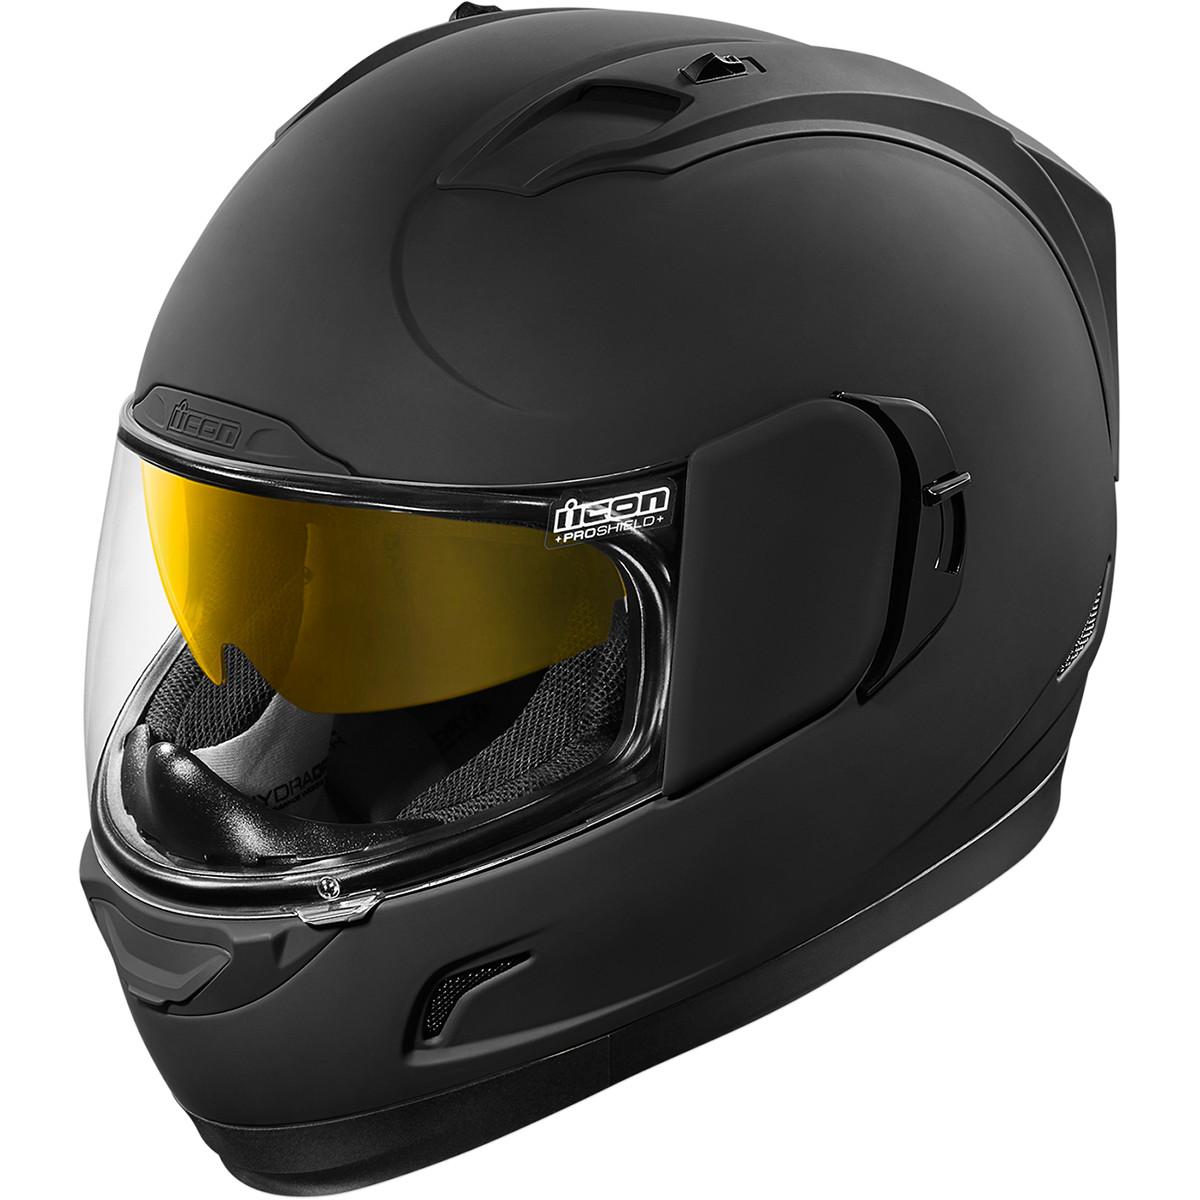 Картинки шлемы на мотоцикл